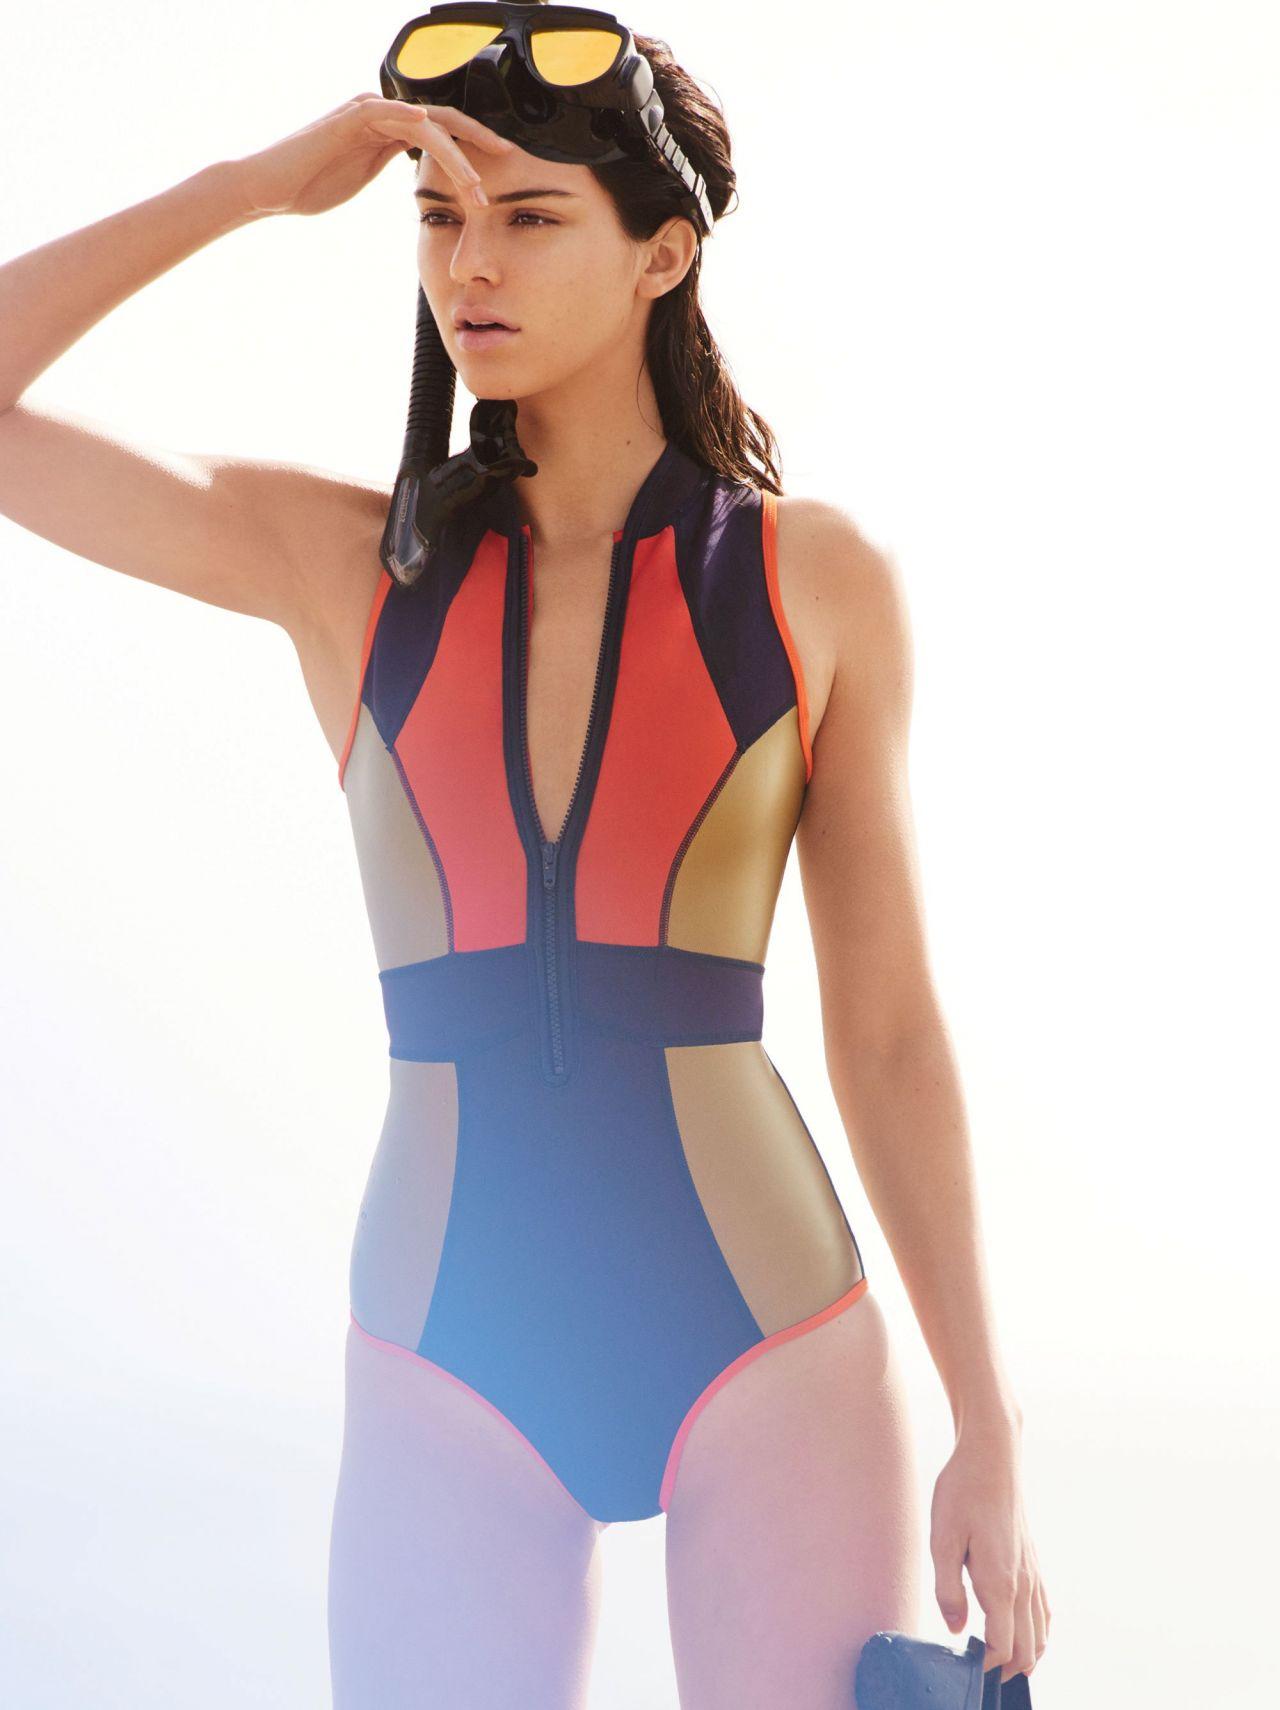 Kendall Jenner Photo Shoot For Vogue Magazine April 2016